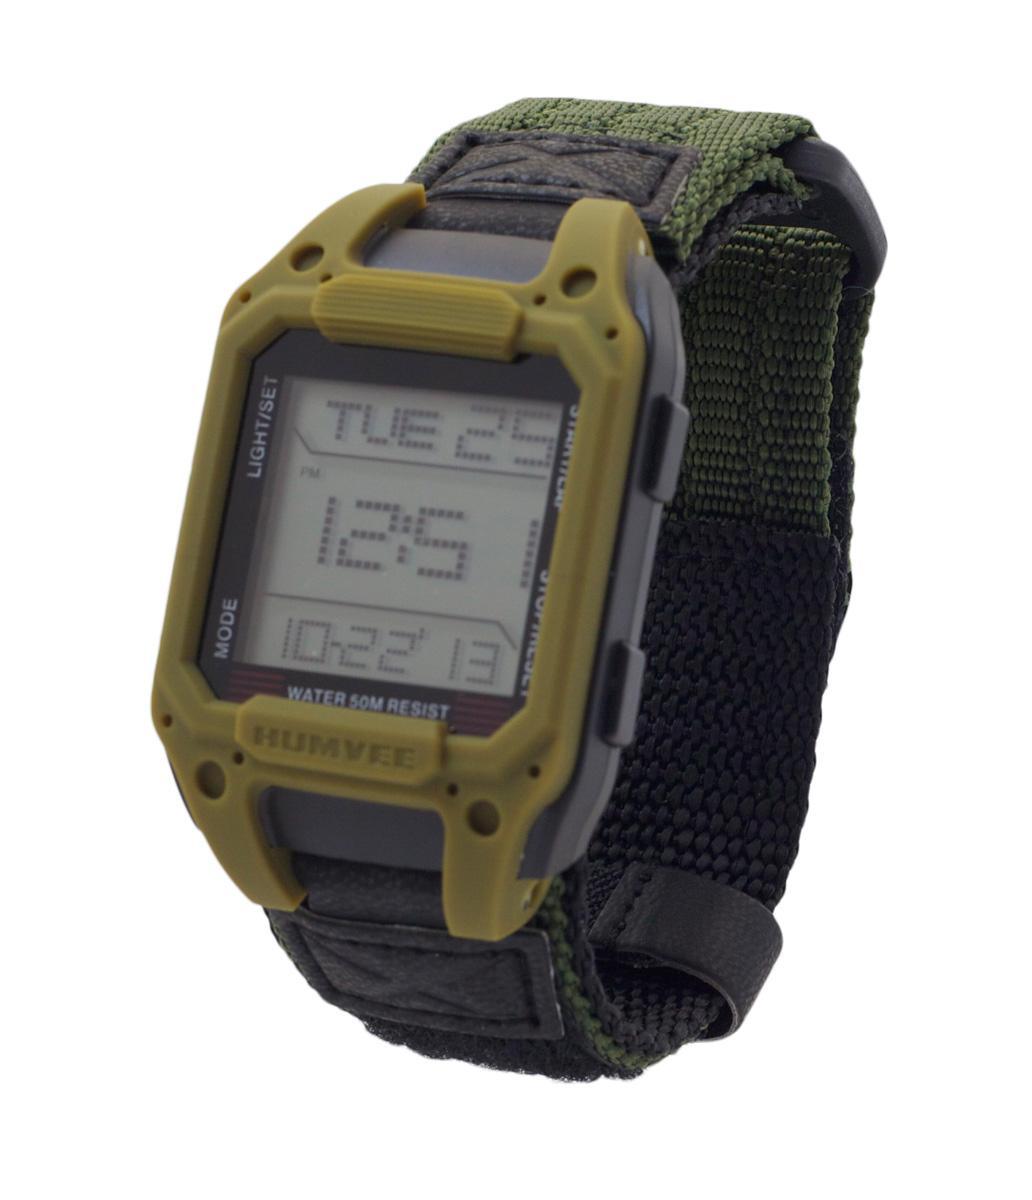 150 Meters Into Feet Humvee Hmv W Rcn Od Digital Recon Watch With Olive Nylon